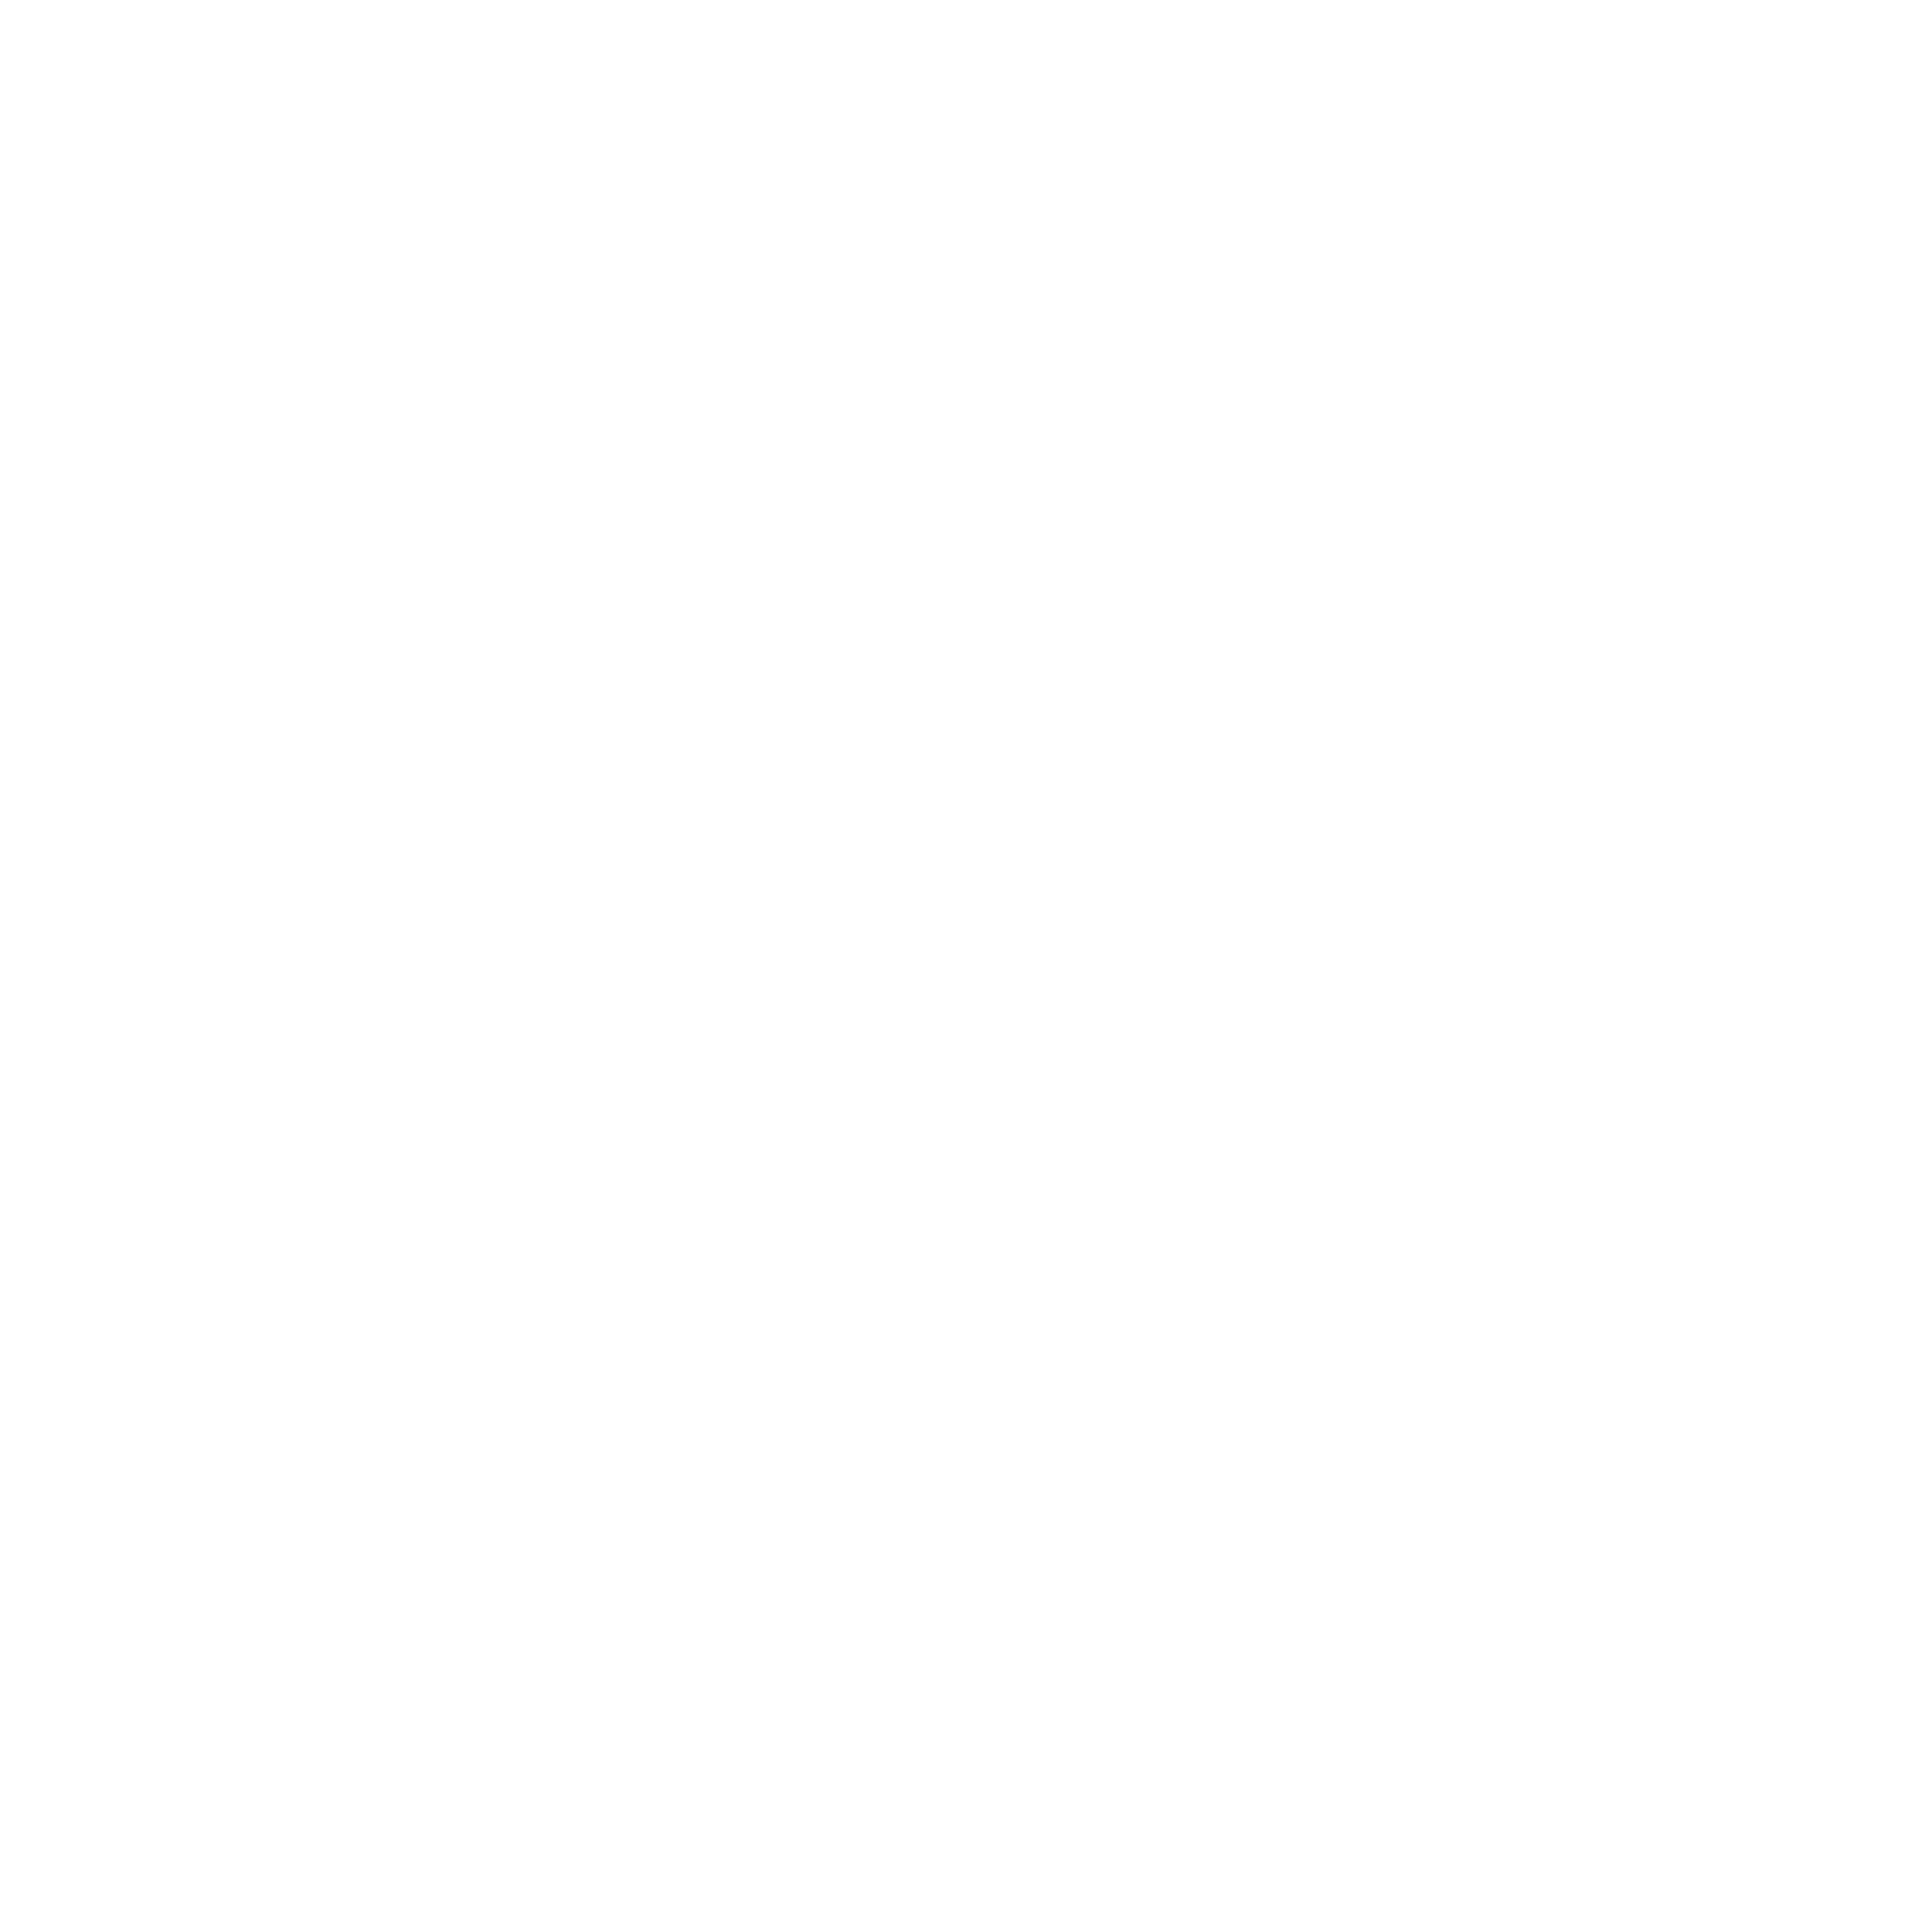 Work_and_dam-THFF-logotype-01